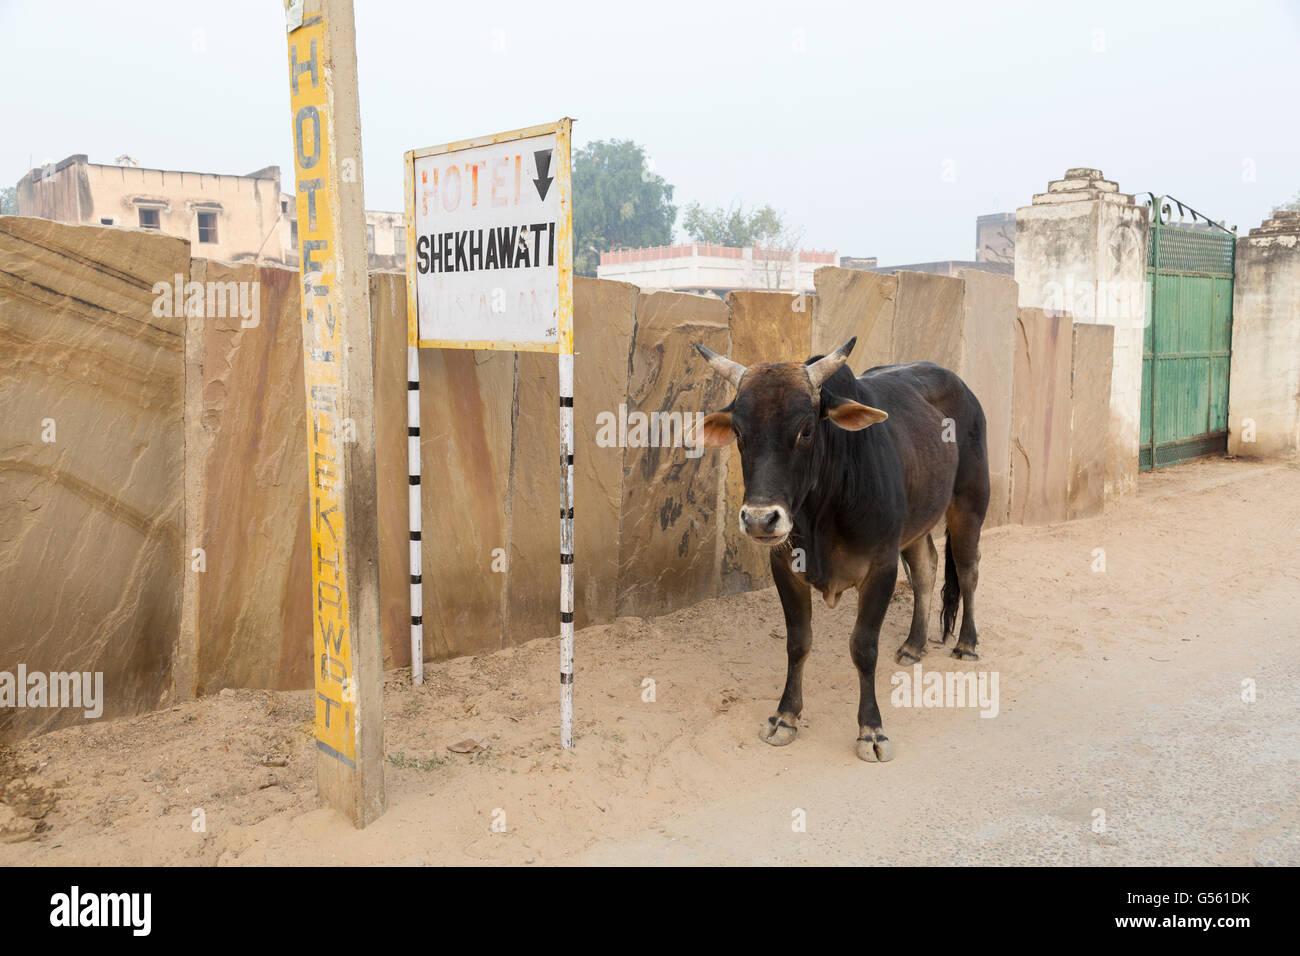 Strassenszene, Mandawa, Rajasthan, Indien Stockbild